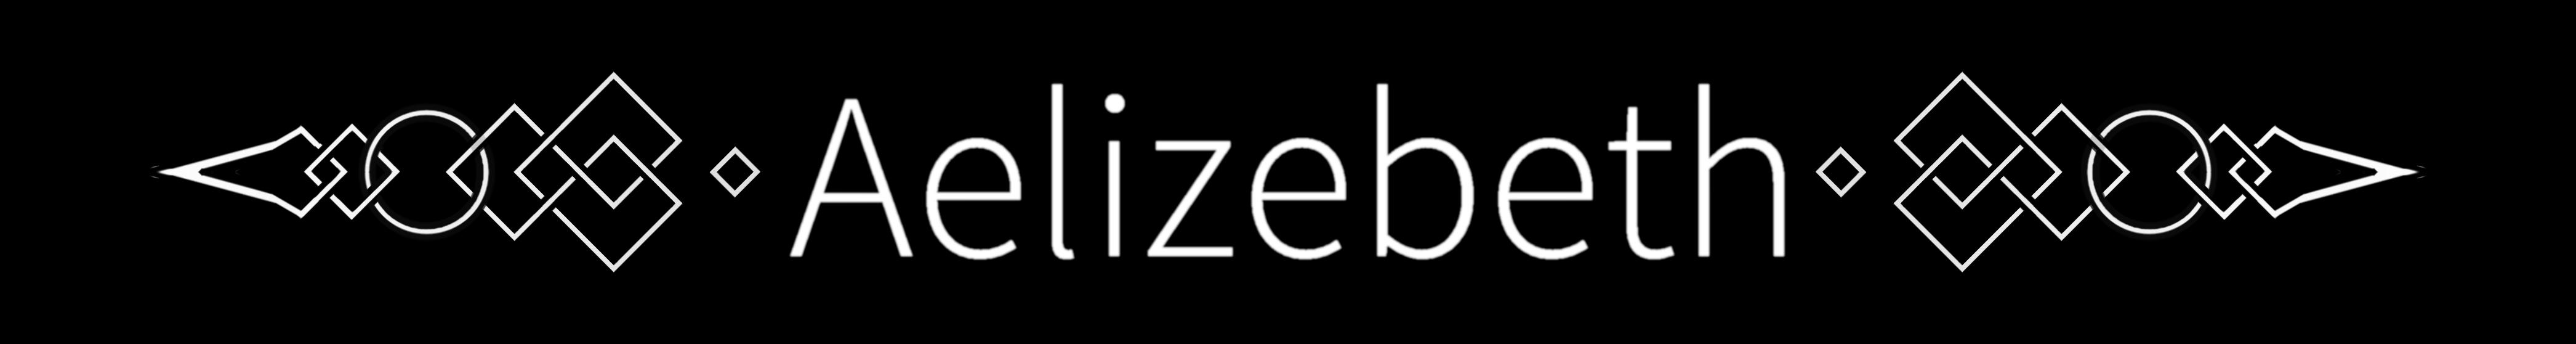 Aelizebeth